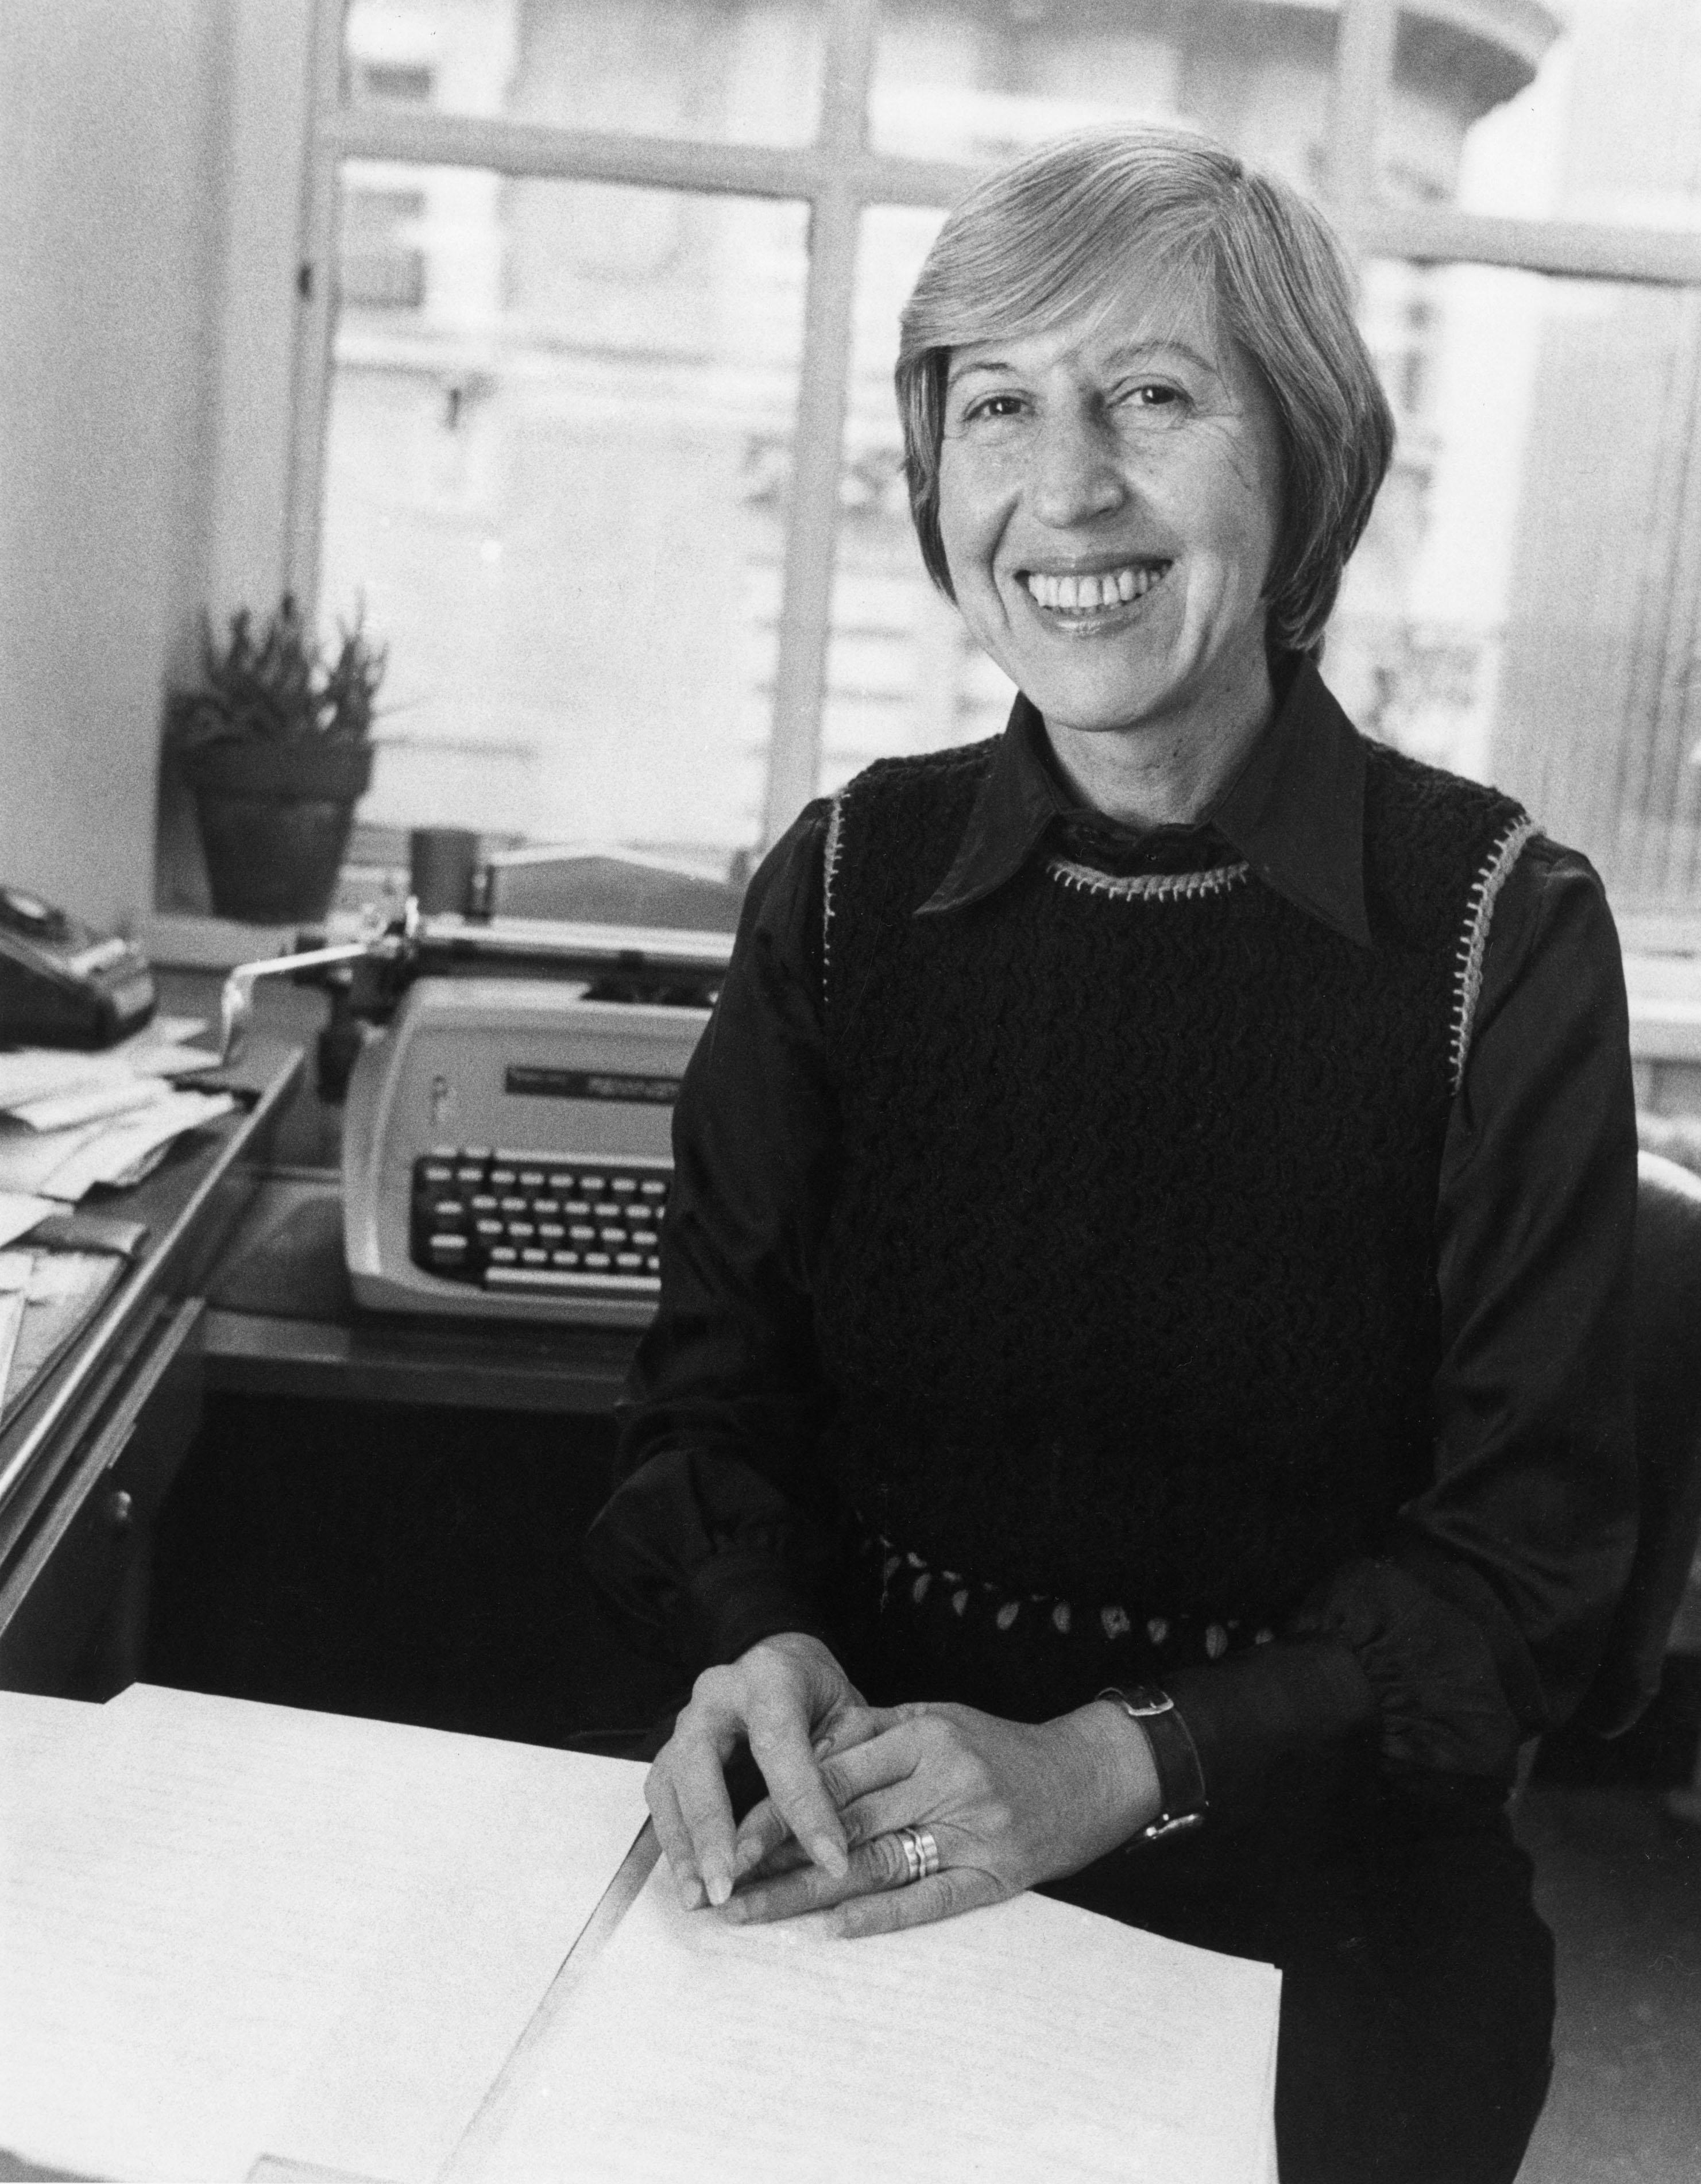 Bernadine Morris in 1976